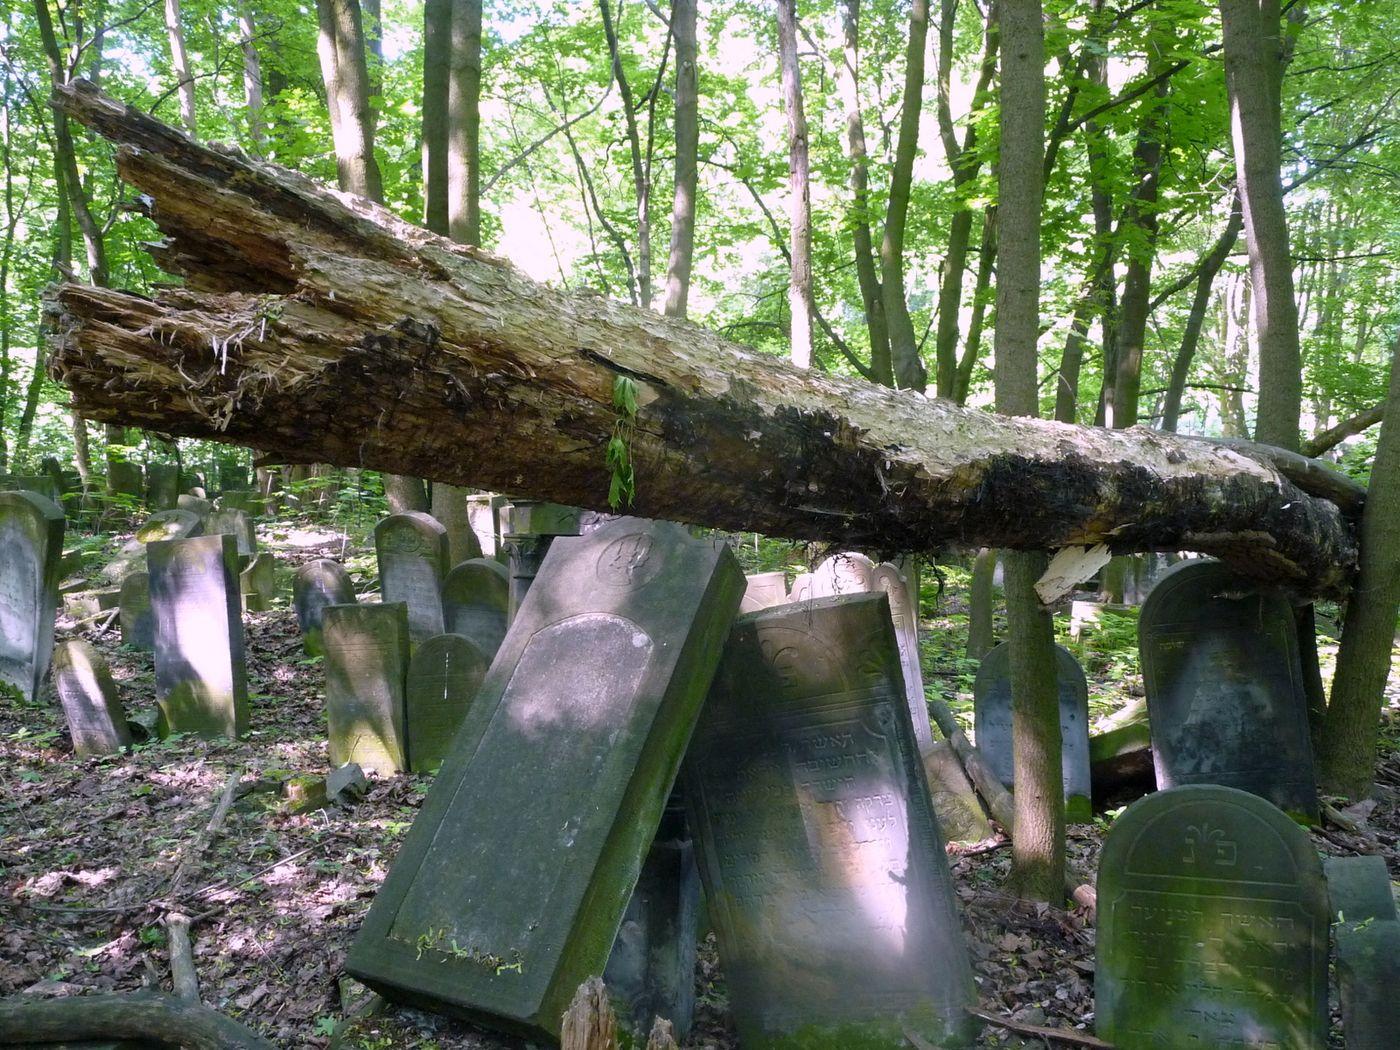 Zarostrlý židovský hřbitov ve Varšavě